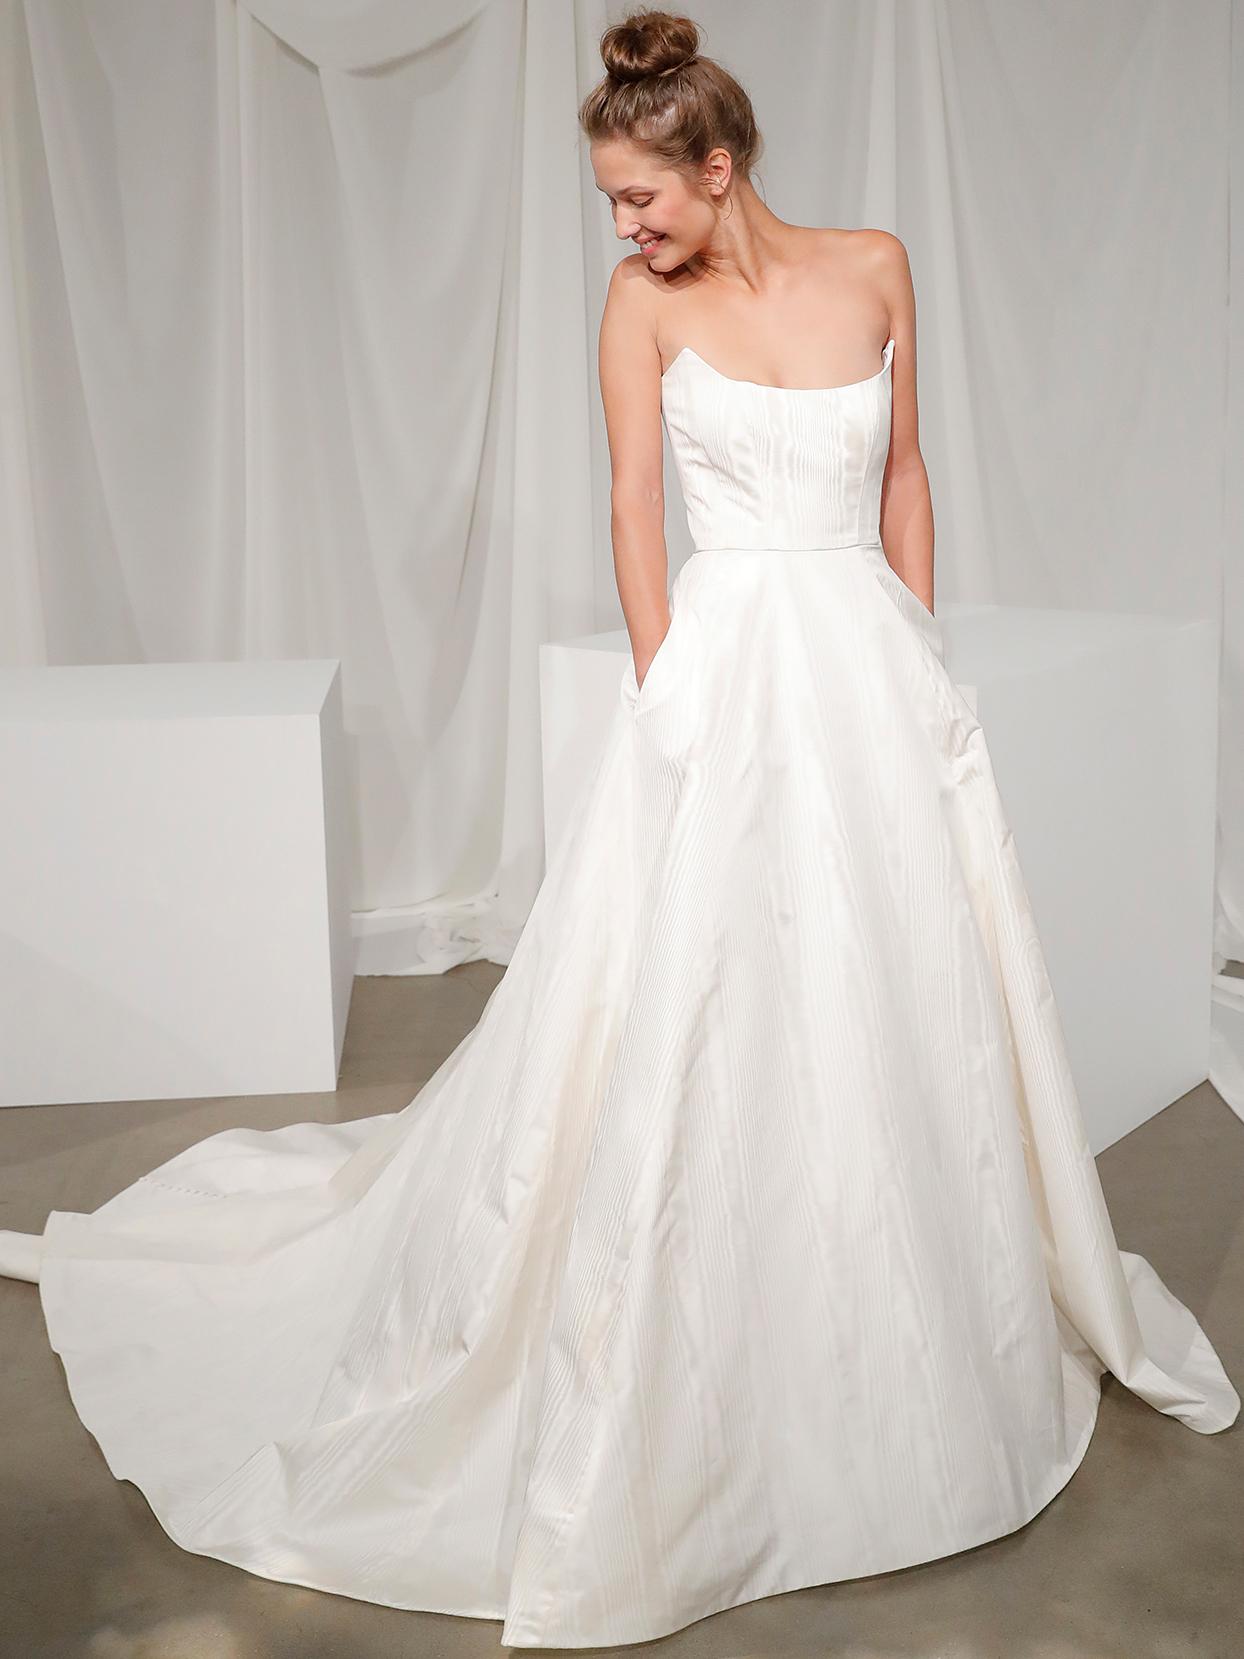 amsale strapless ball gown wedding dress fall 2020